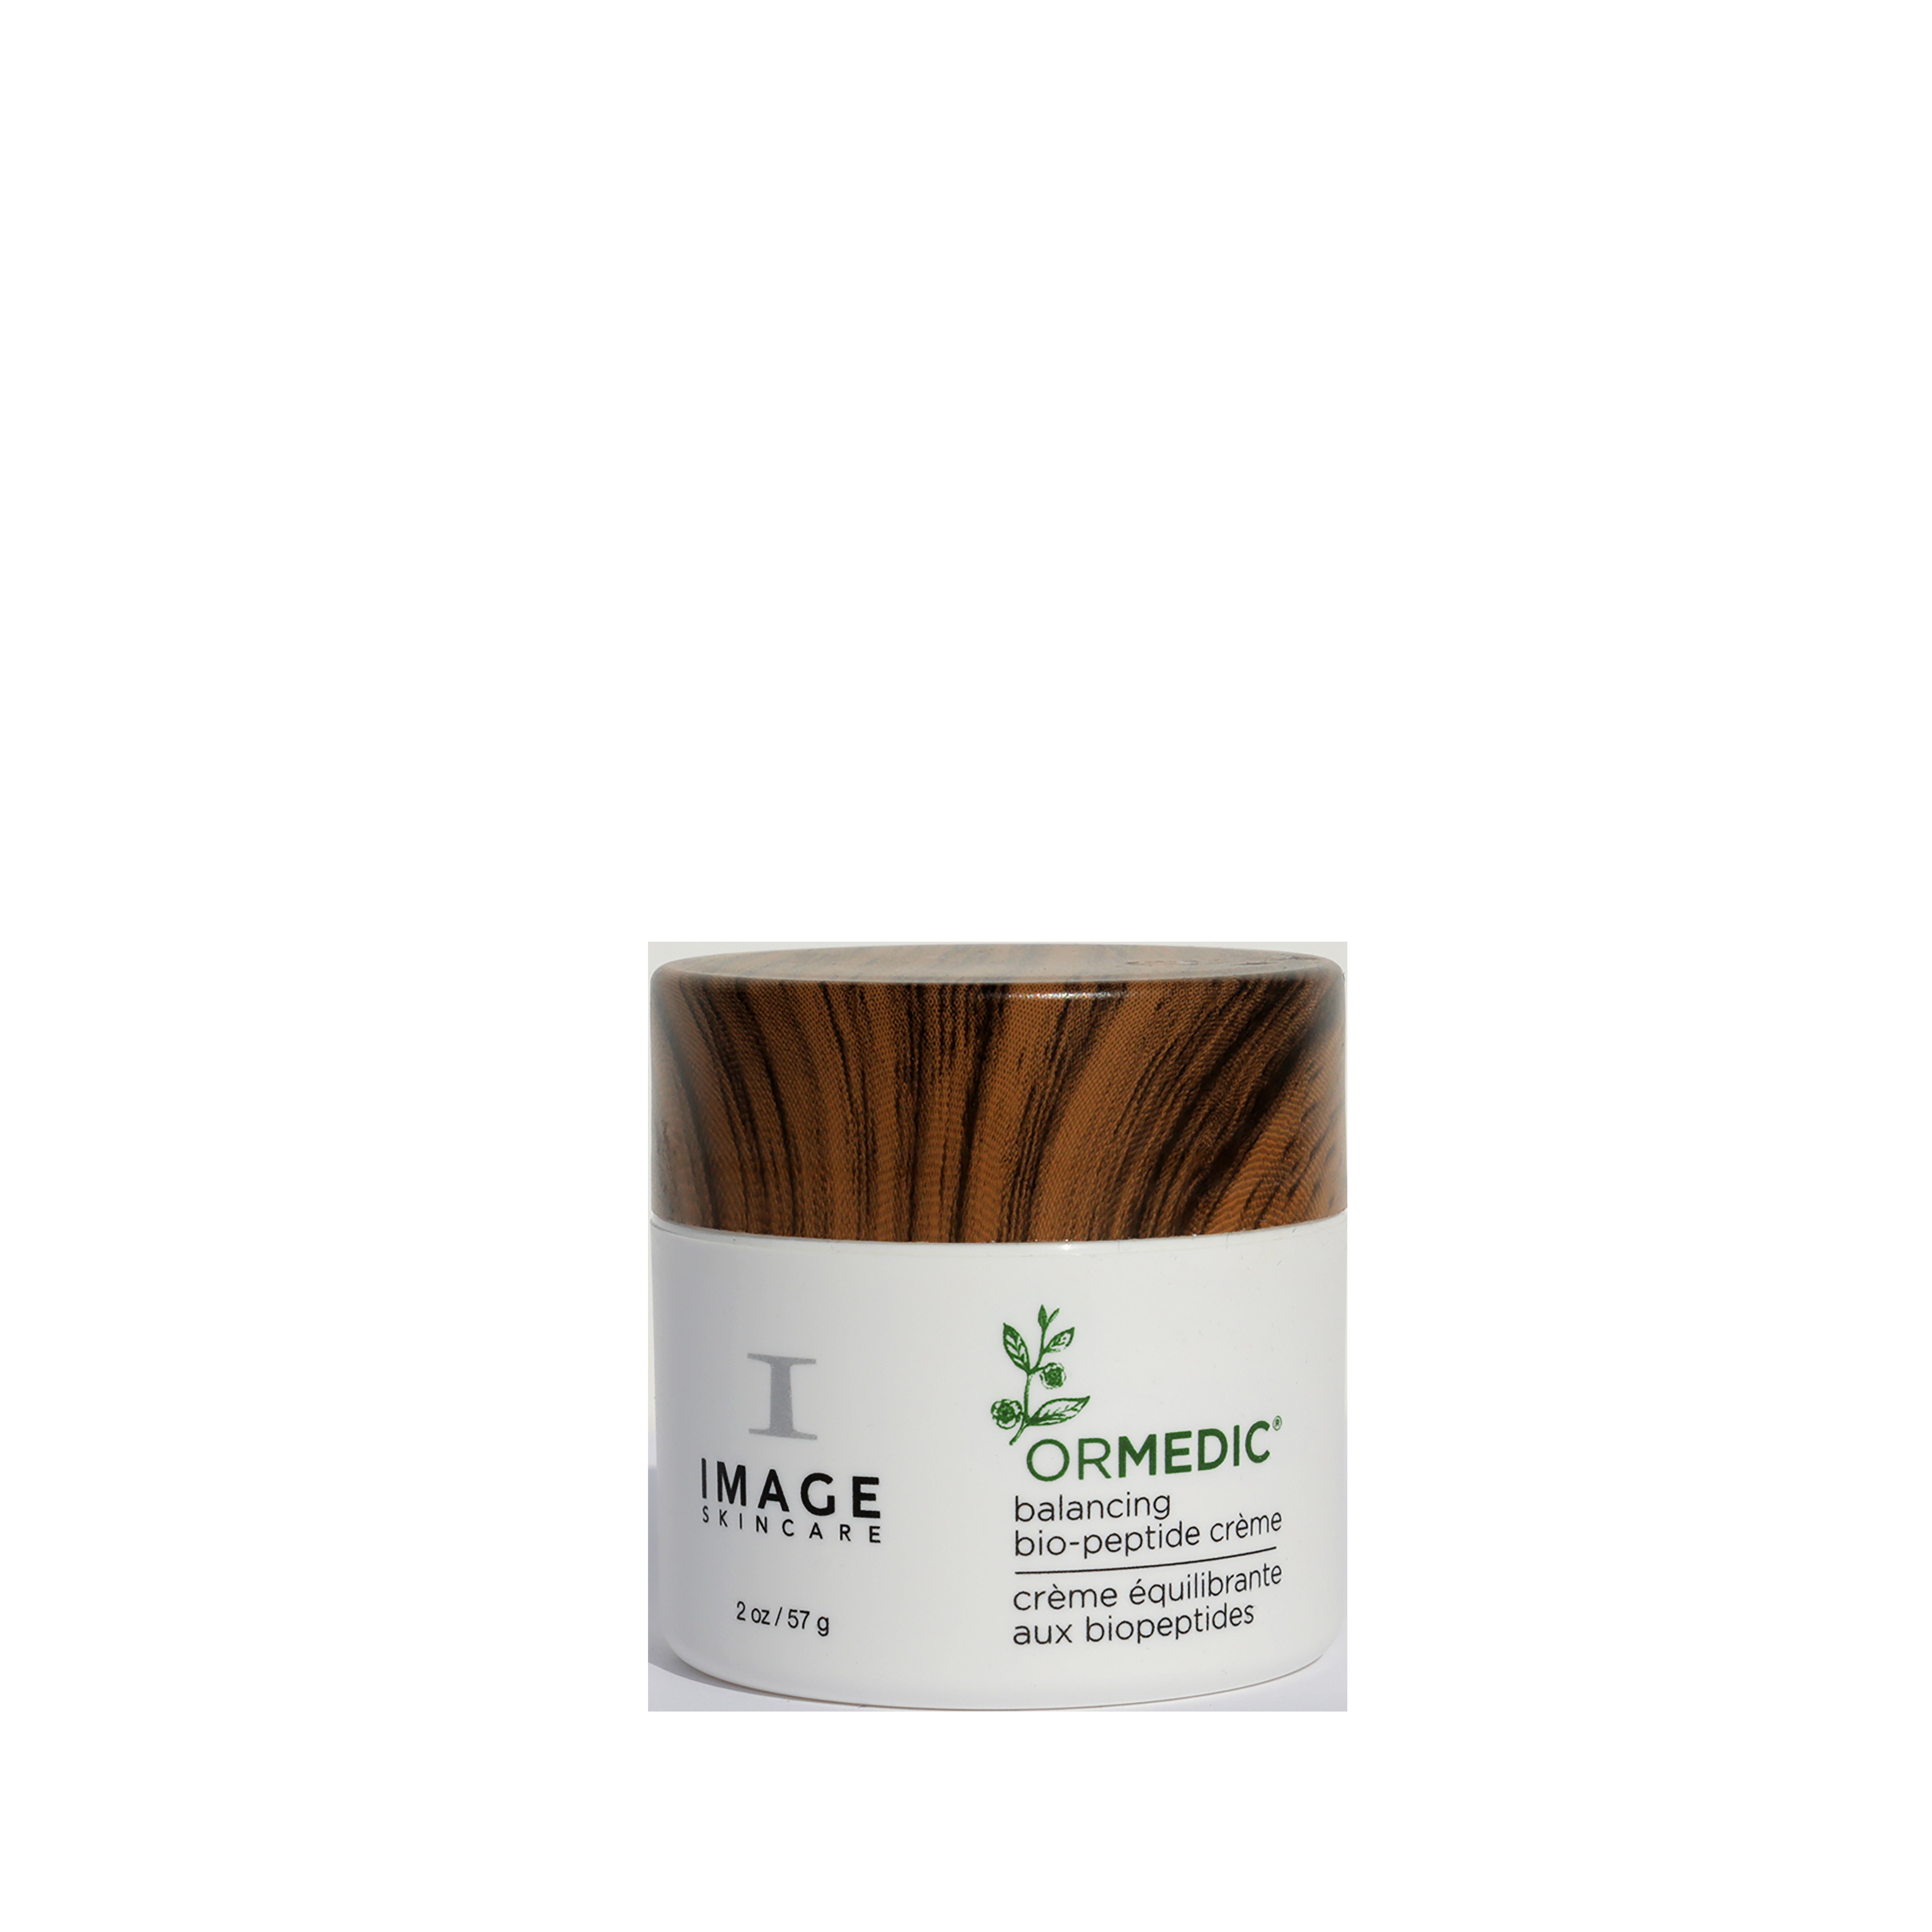 Image Skincare ORMEDIC Balancing Bio Peptide Crème